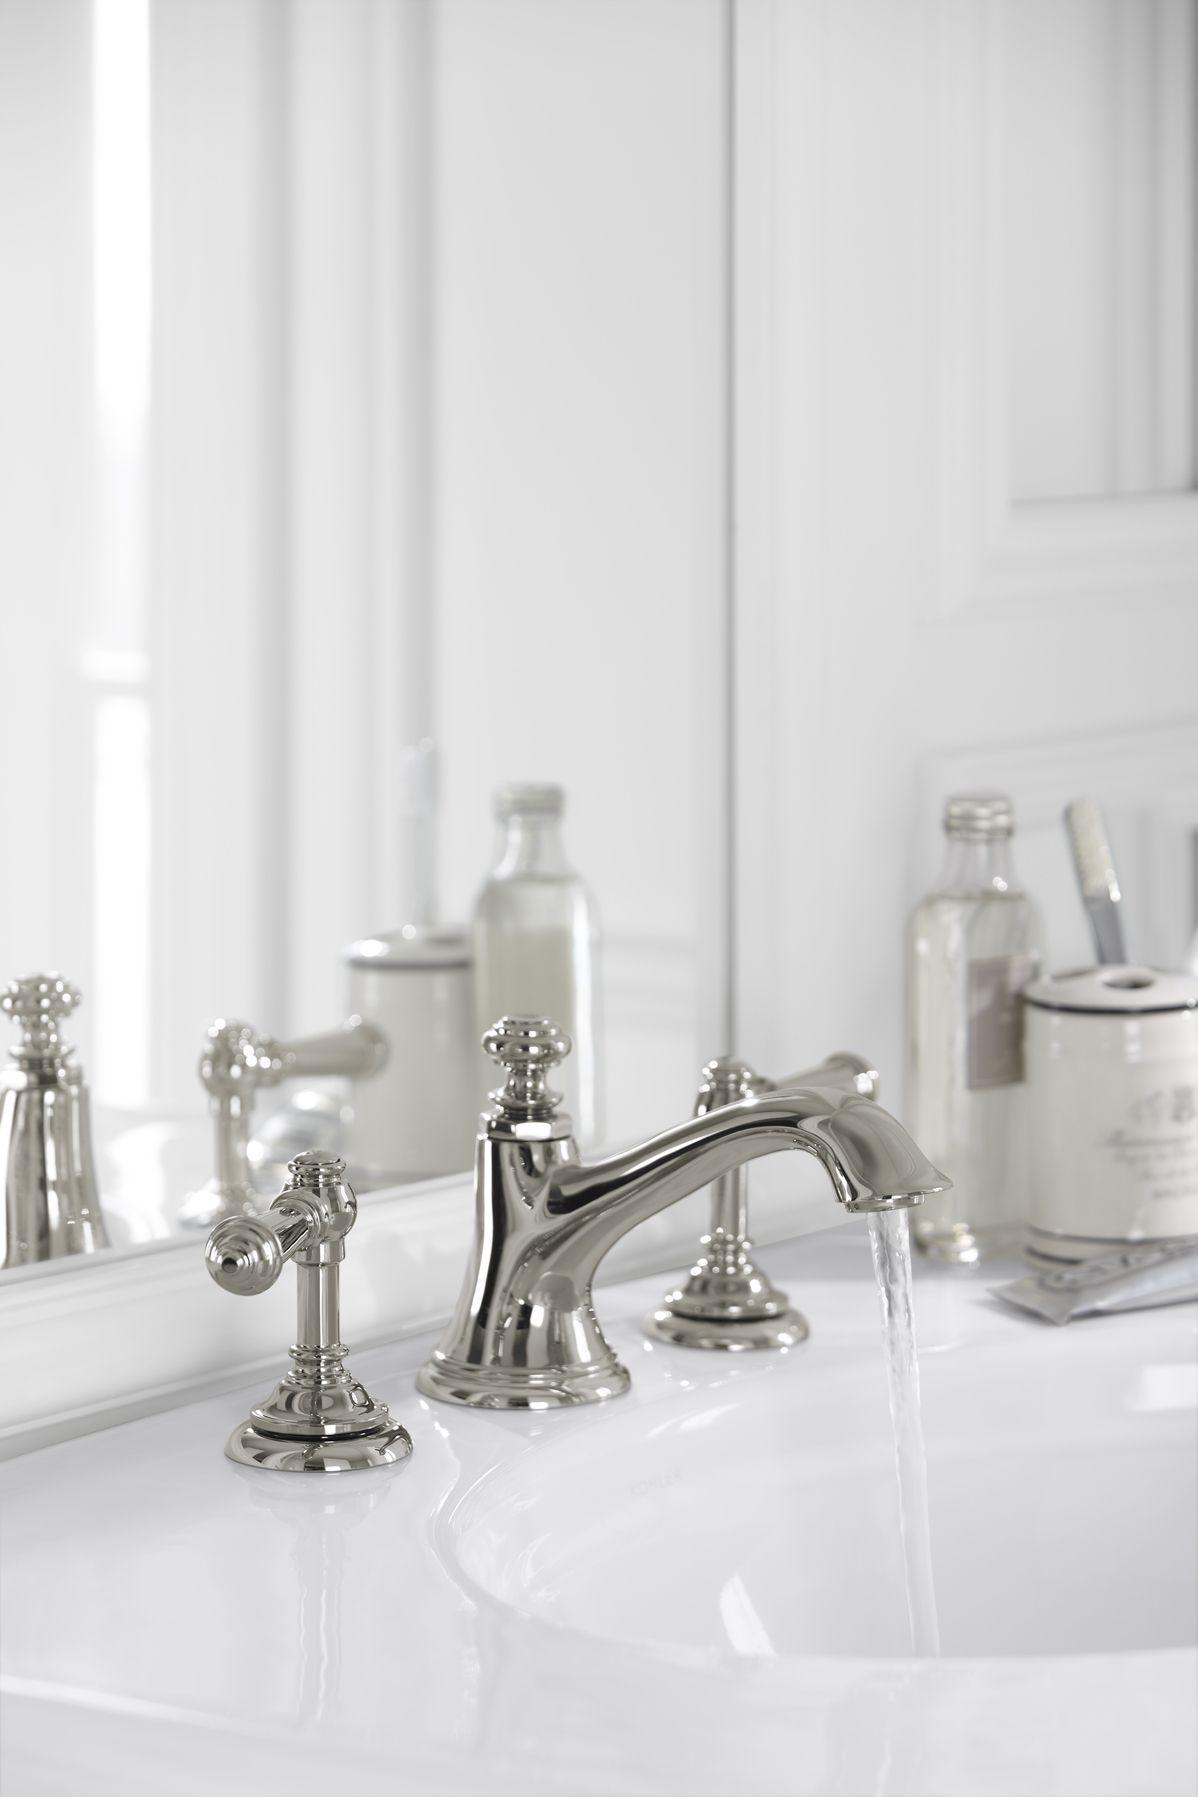 Fine Kohler Bathroom Faucet Collections Image - Water Faucet Ideas ...